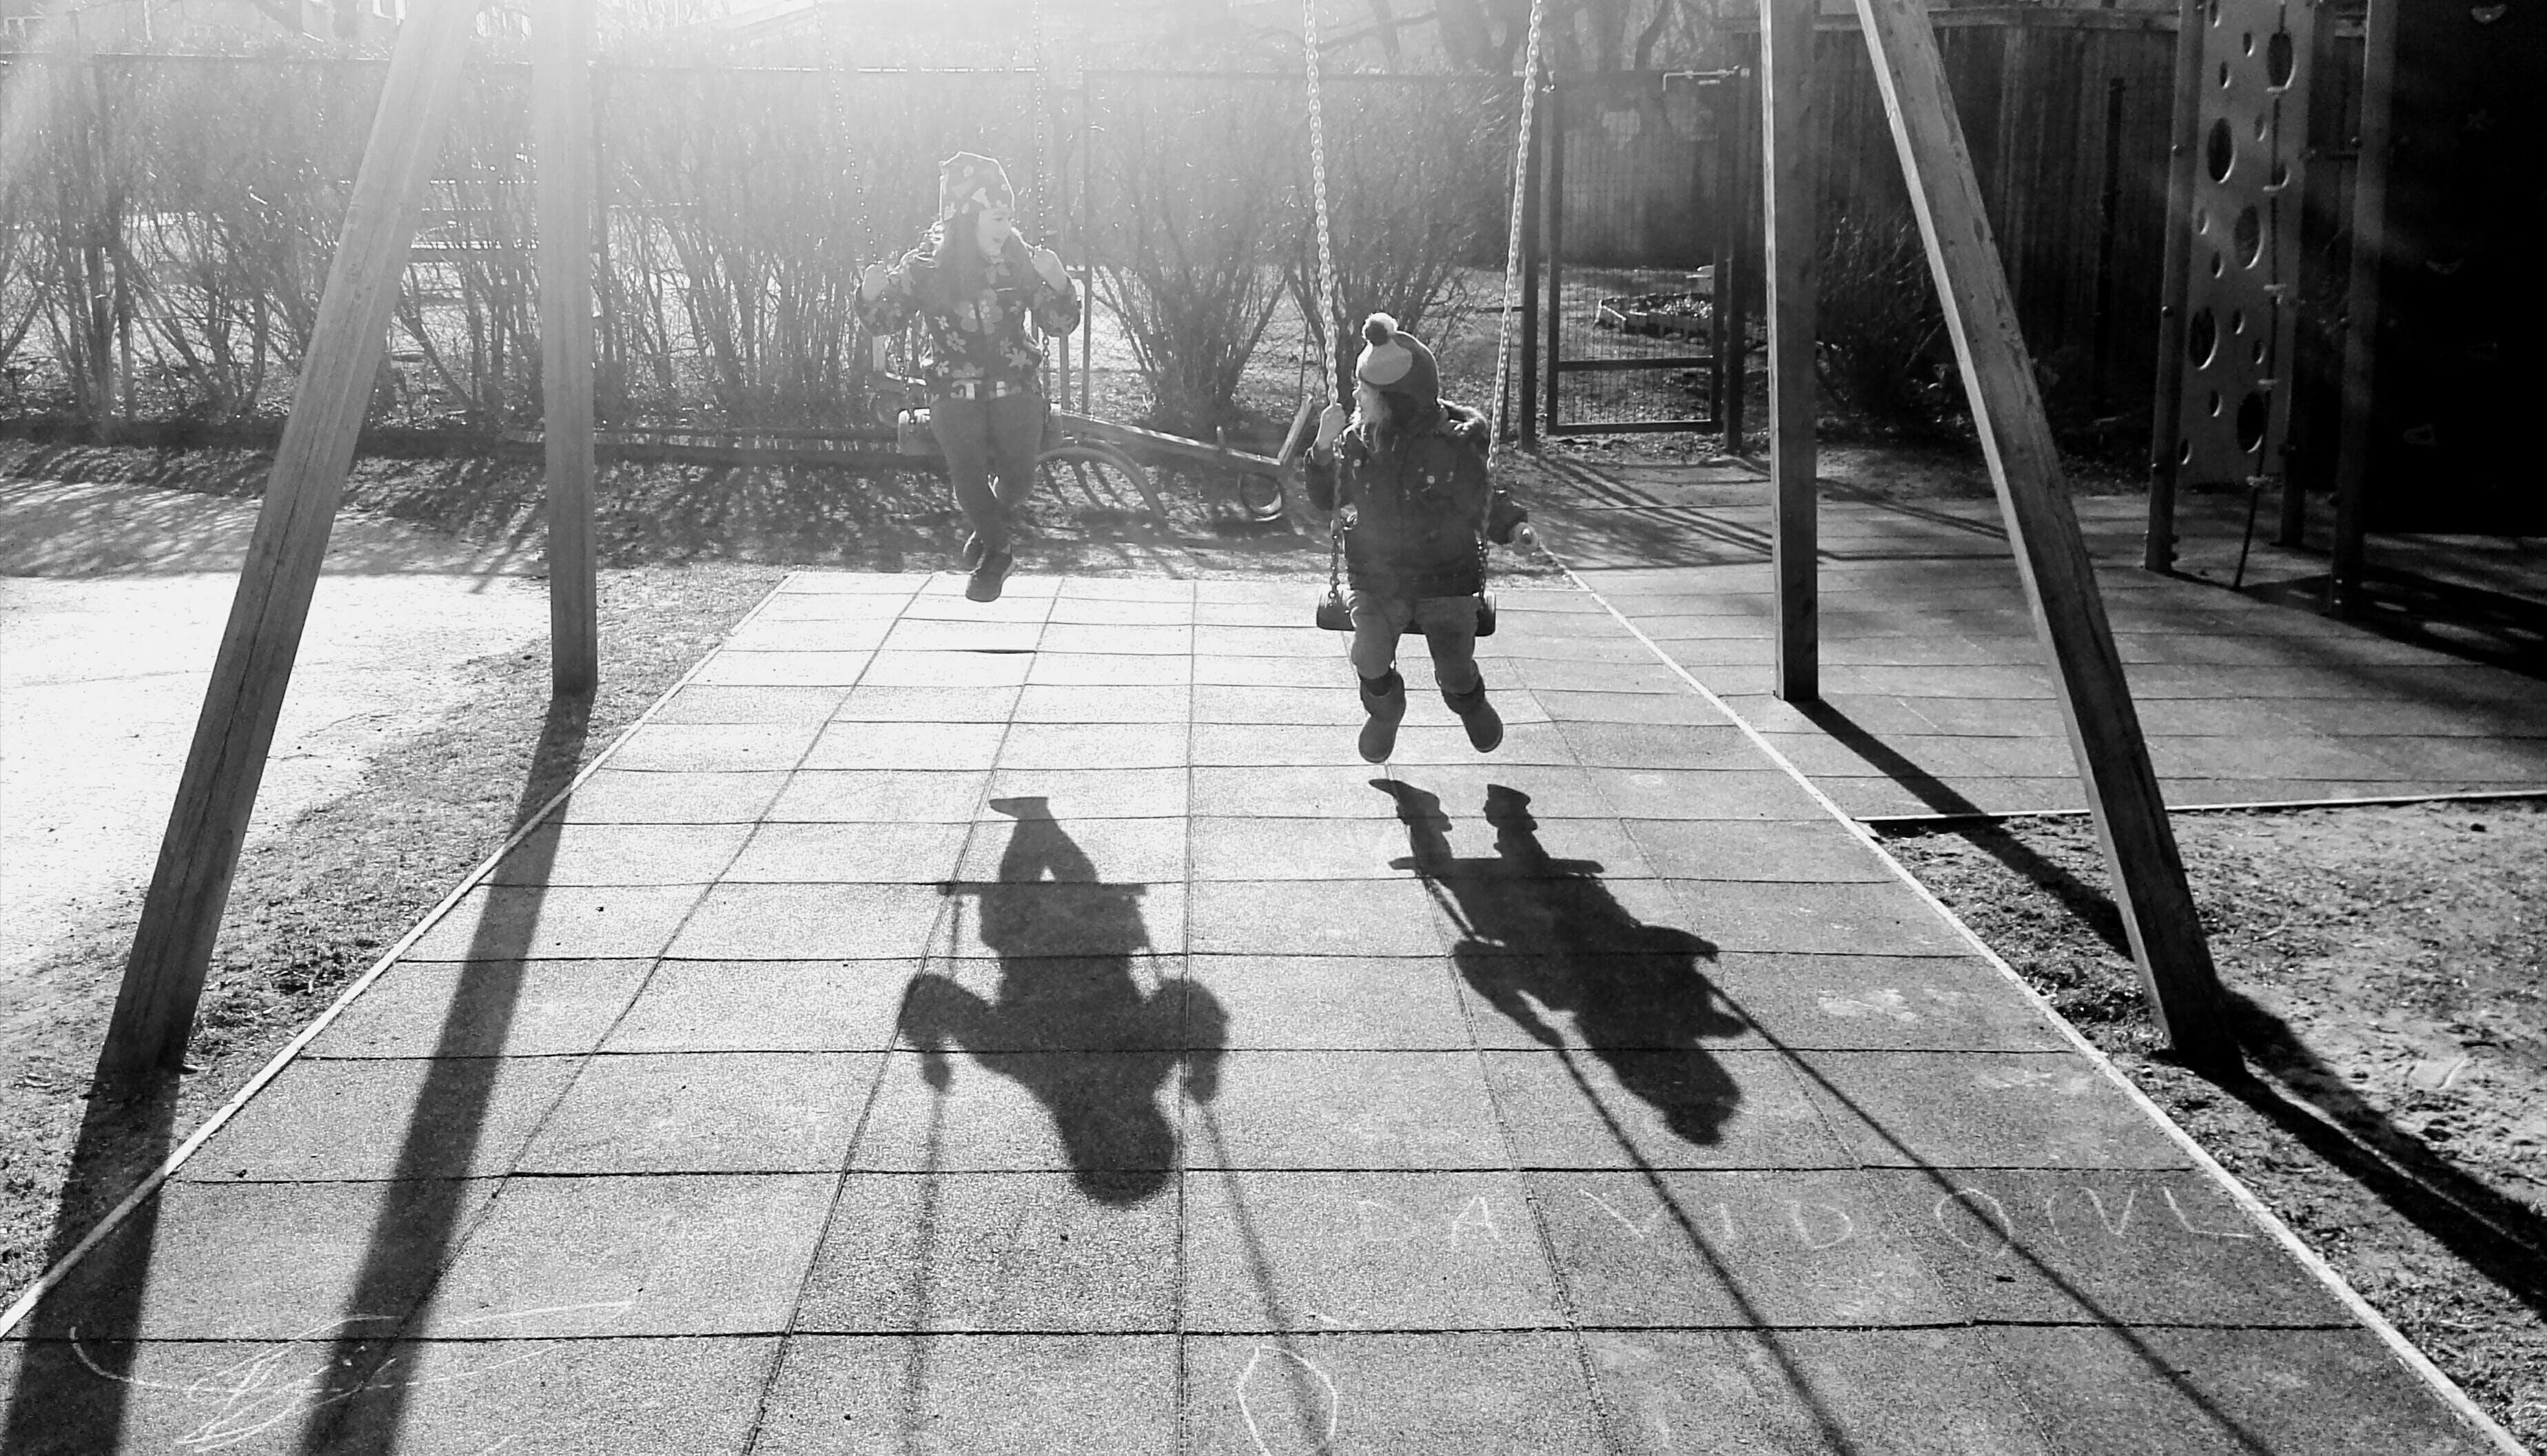 Monochrome Photography of Children On Swing